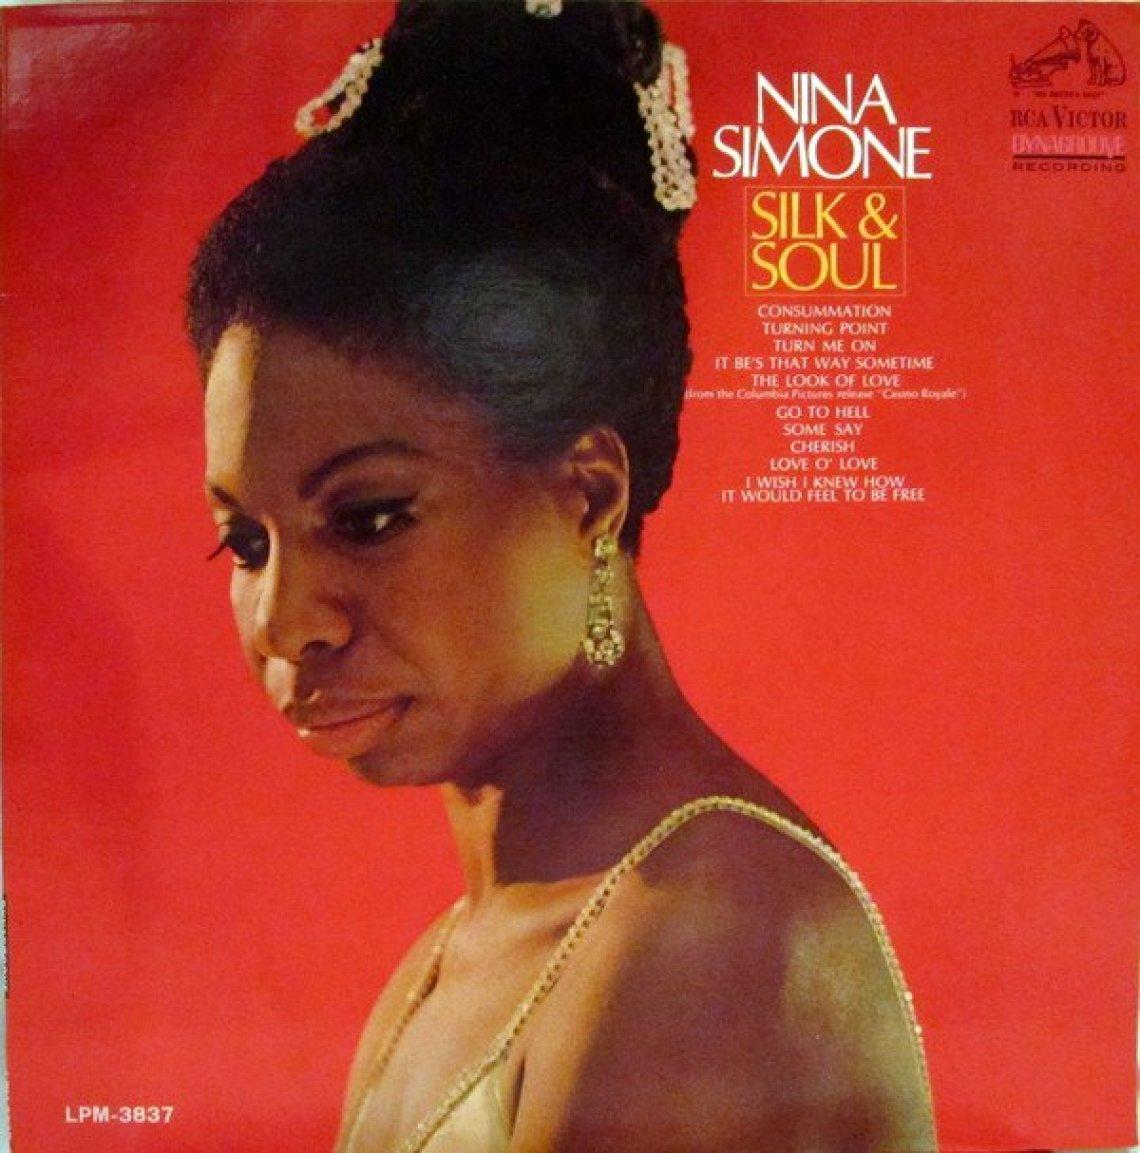 Silk & Soul (1967) album cover - 40 Best Nina Simone Songs (The Legend Slot) - Female Original